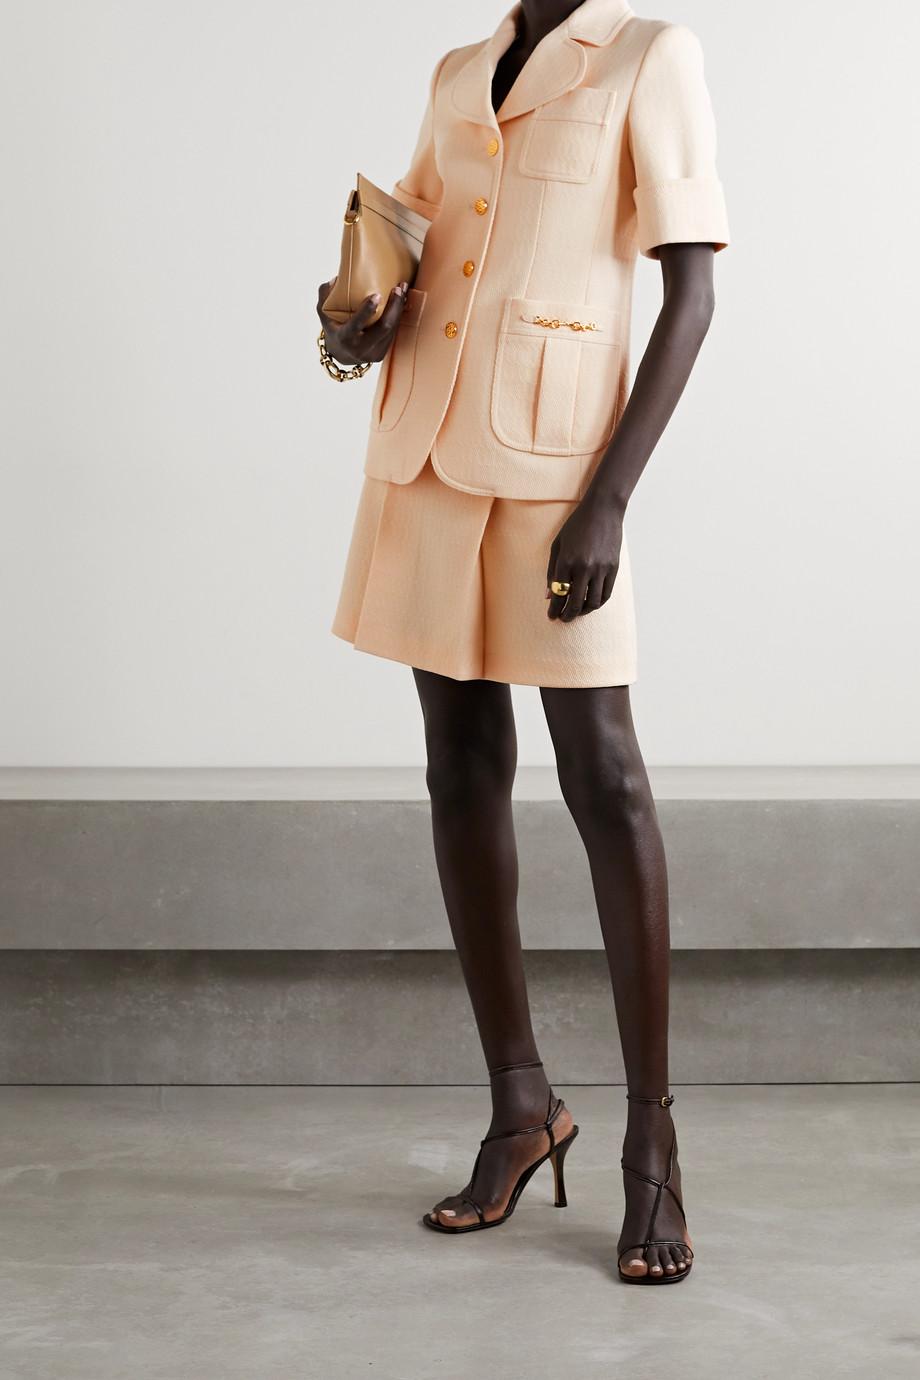 Gucci Jacke aus Woll-Jacquard mit Horsebit-Details